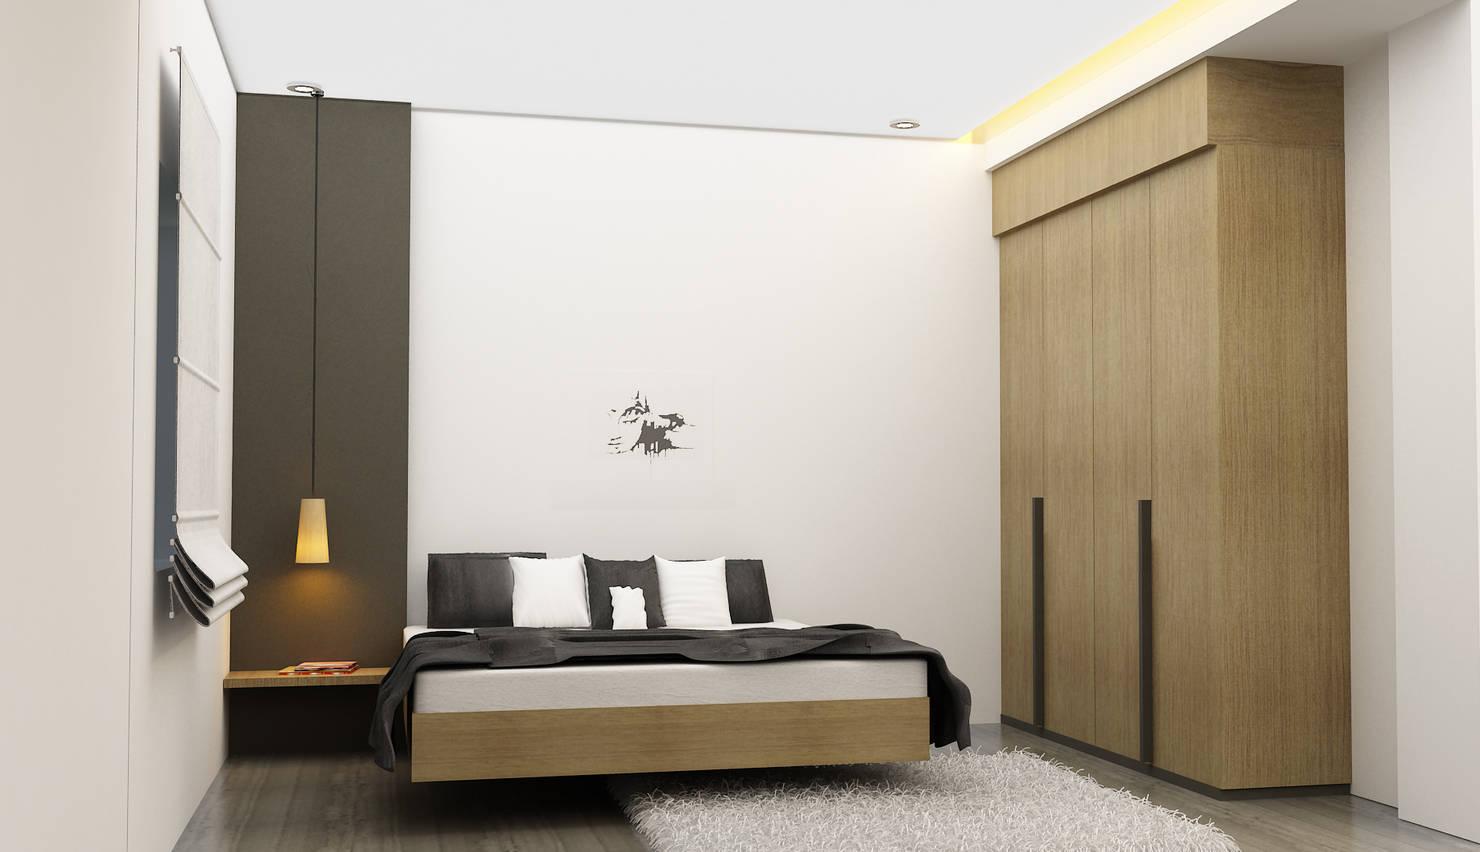 Residential:  Bedroom by Designism